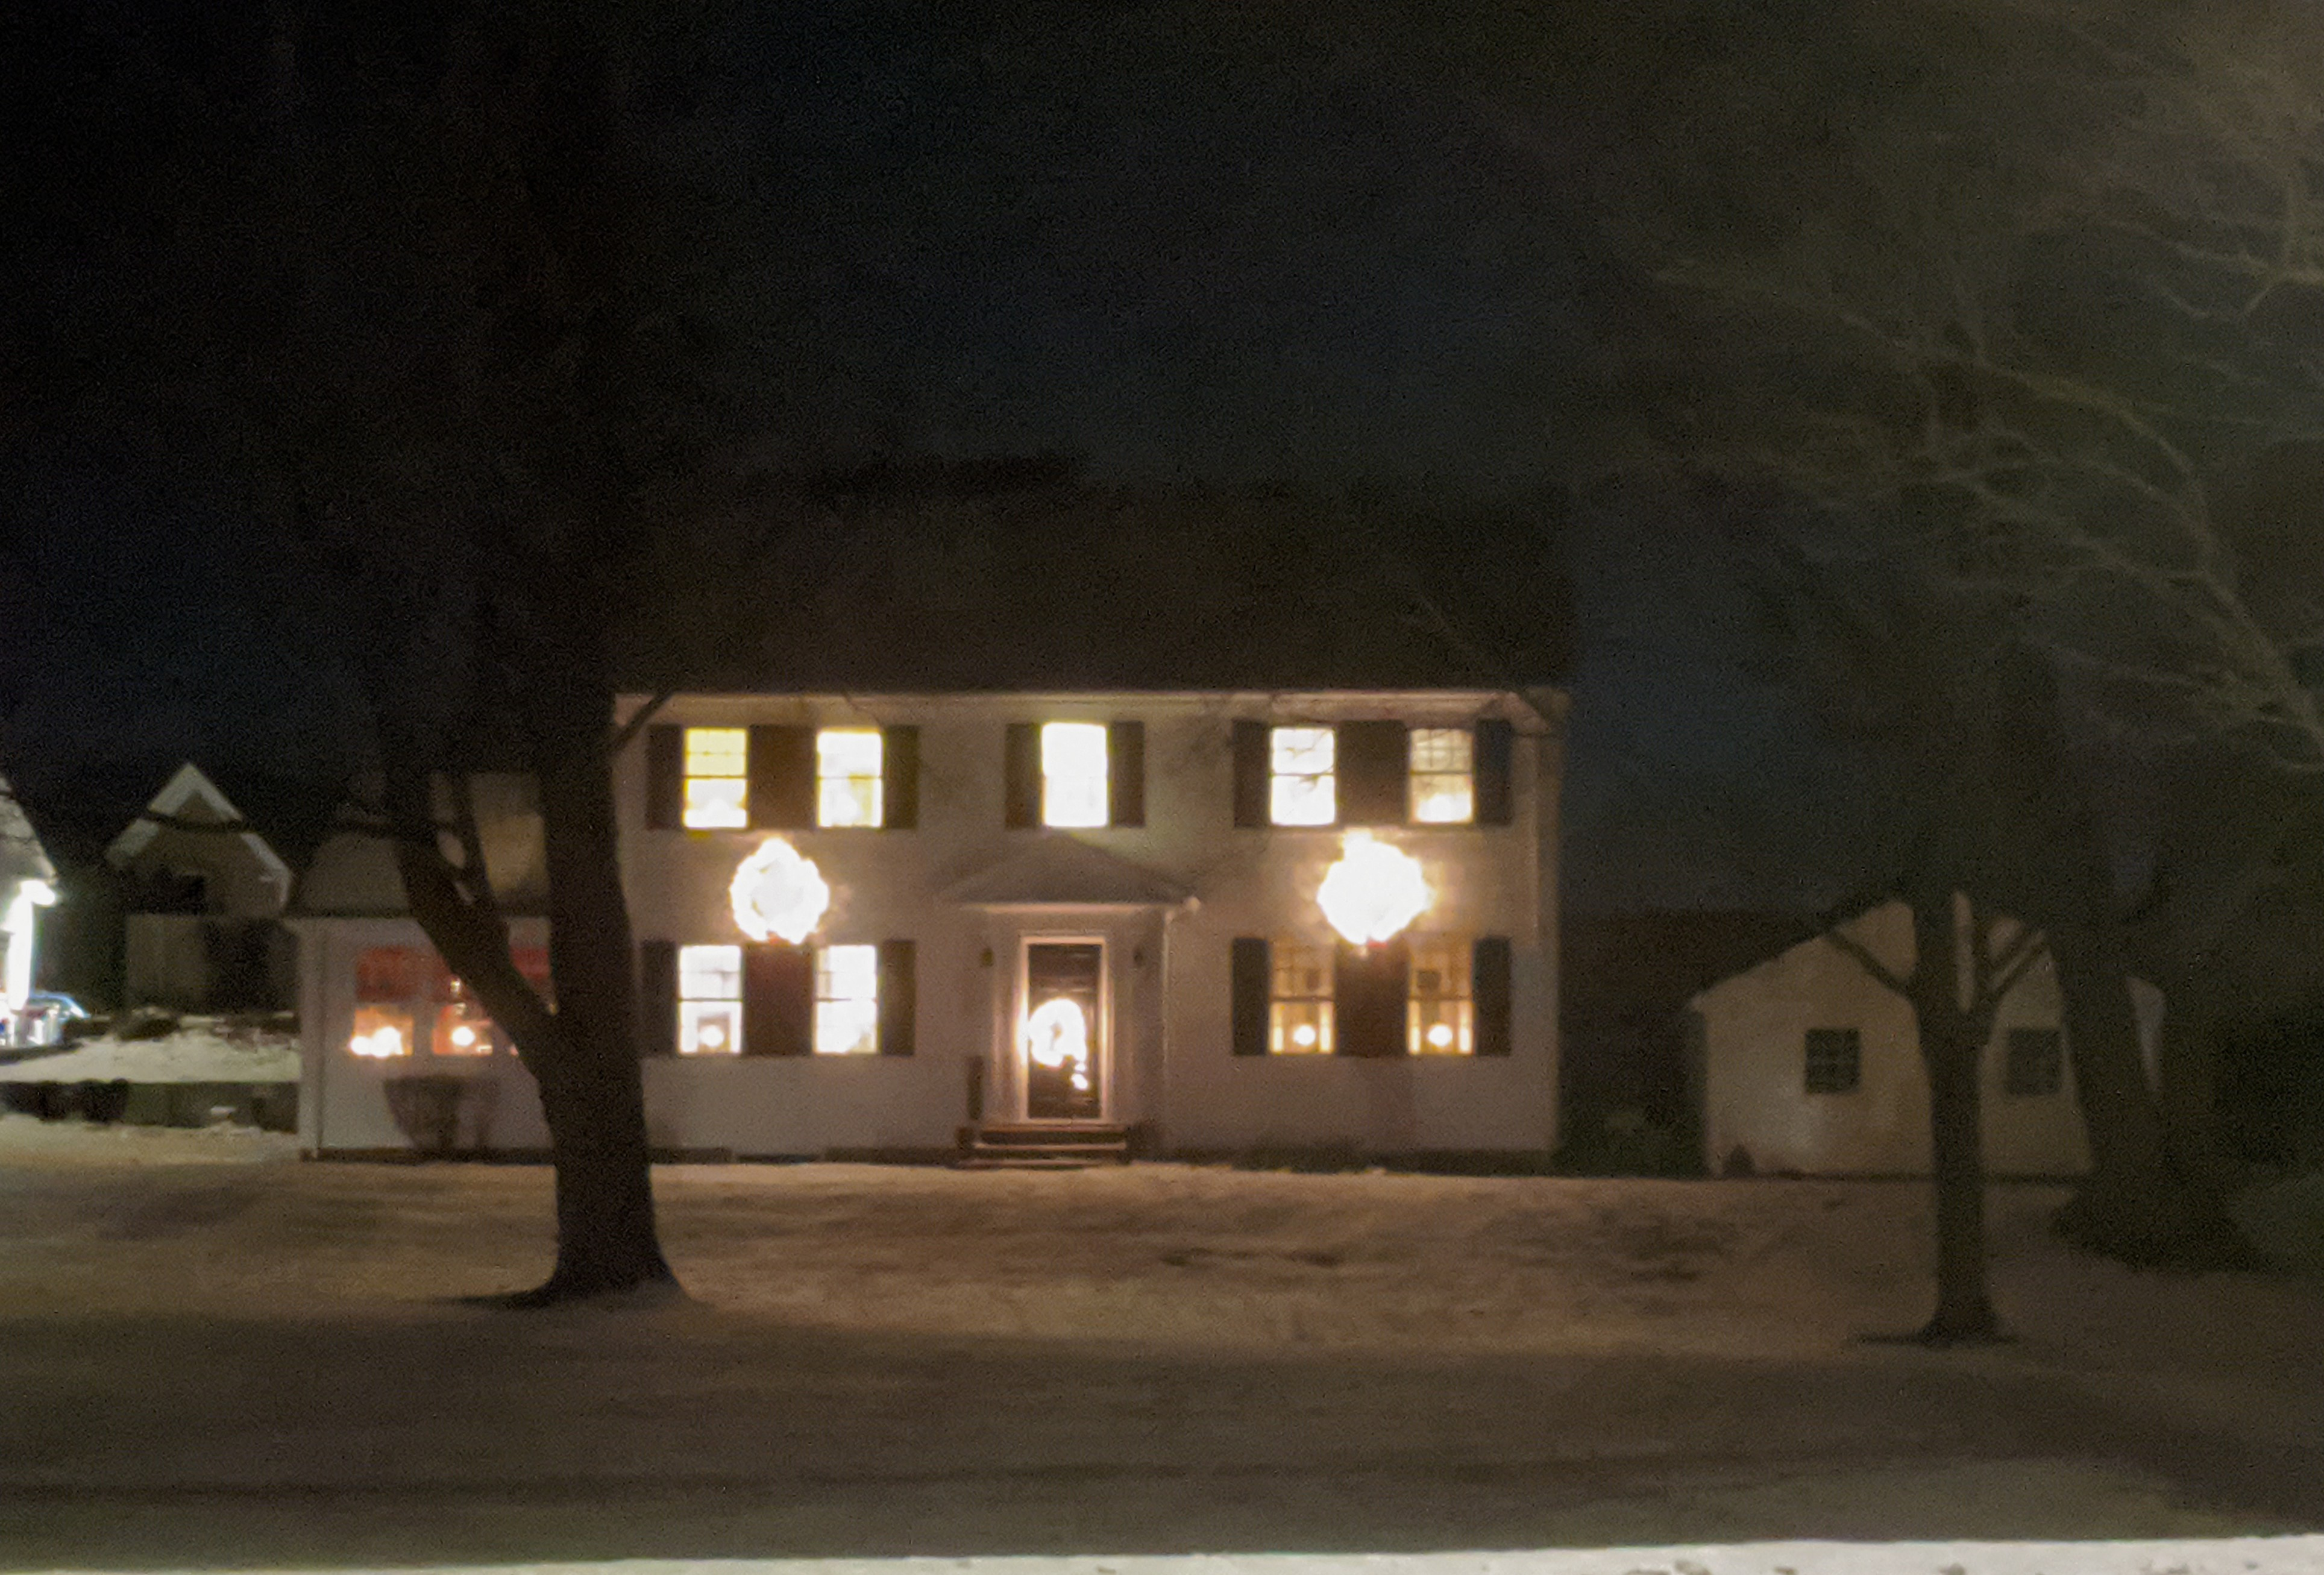 Holiday lights decorated homes_ Christmas 2019 Gloucester Mass_20191219_©c ryan (2).jpg